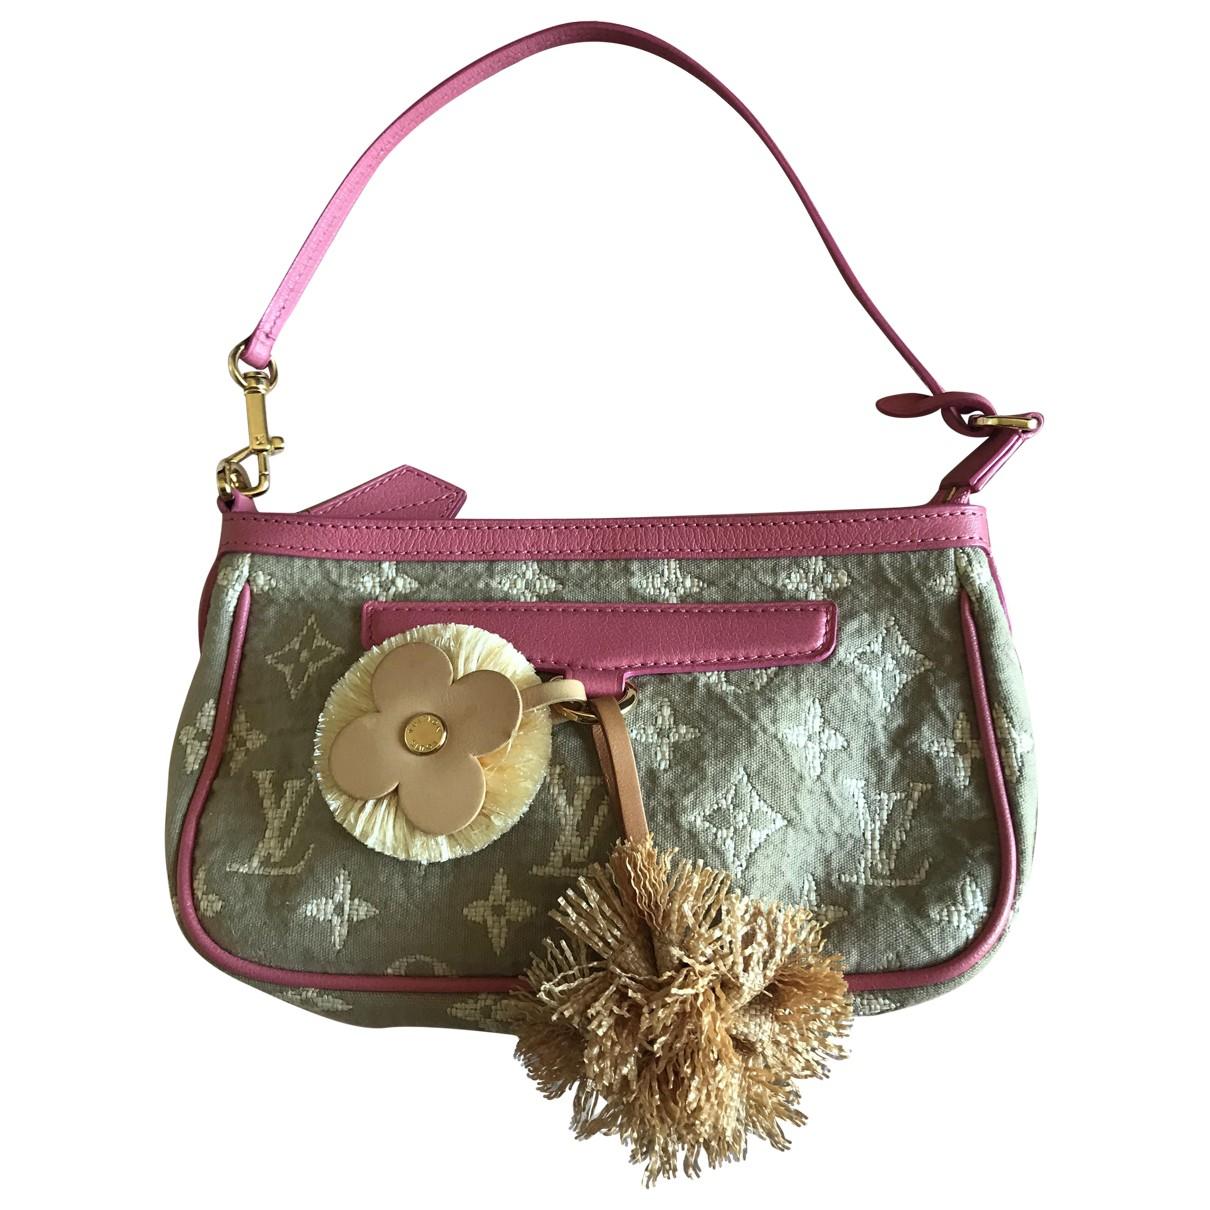 Louis Vuitton Pochette Accessoire Clutch in  Gruen Baumwolle